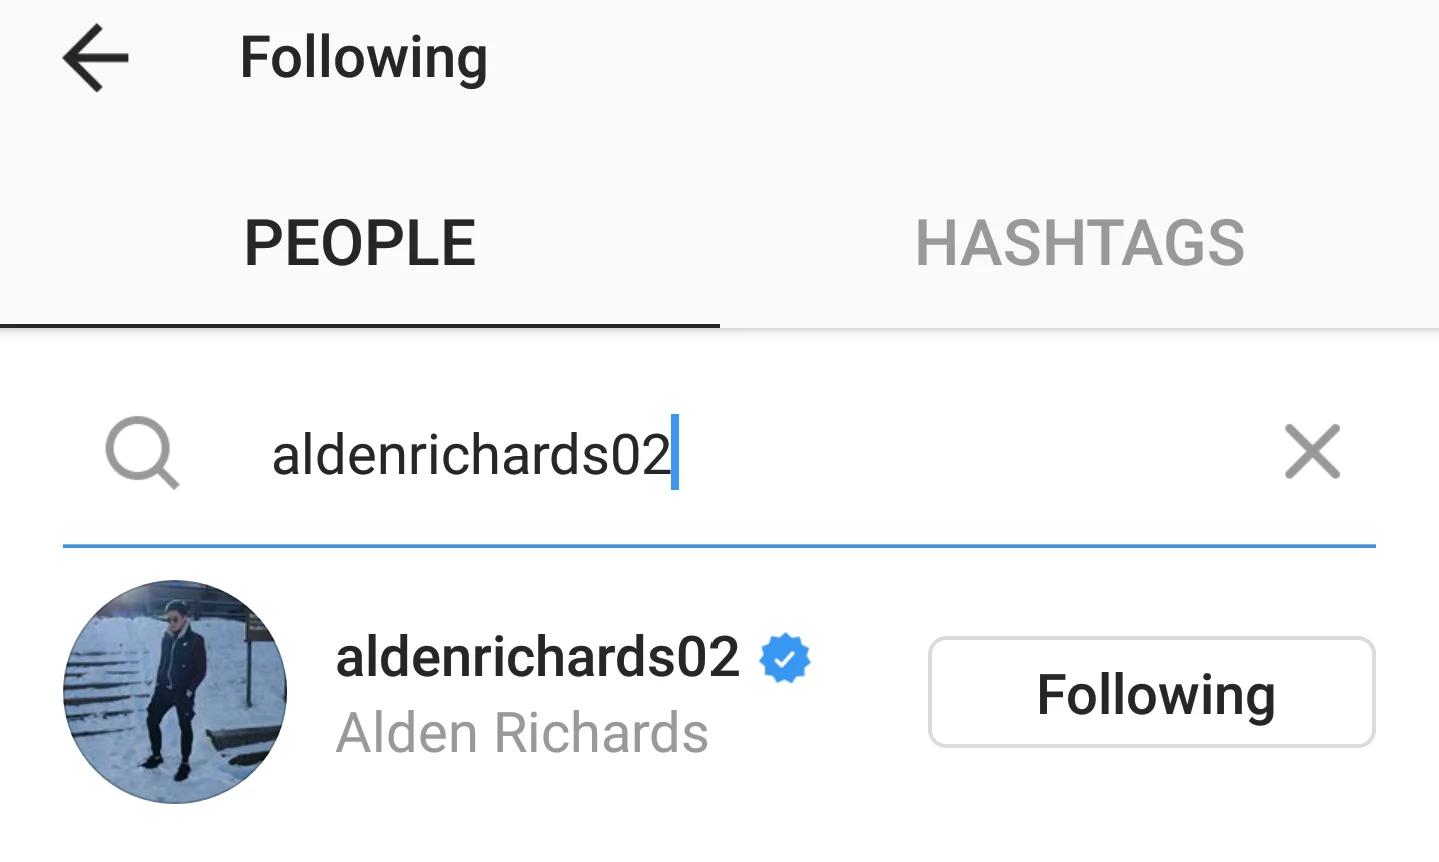 Echosera ka daw! Maine Mendoza follows back Alden Richards, netizens are not convinced that it was an accident